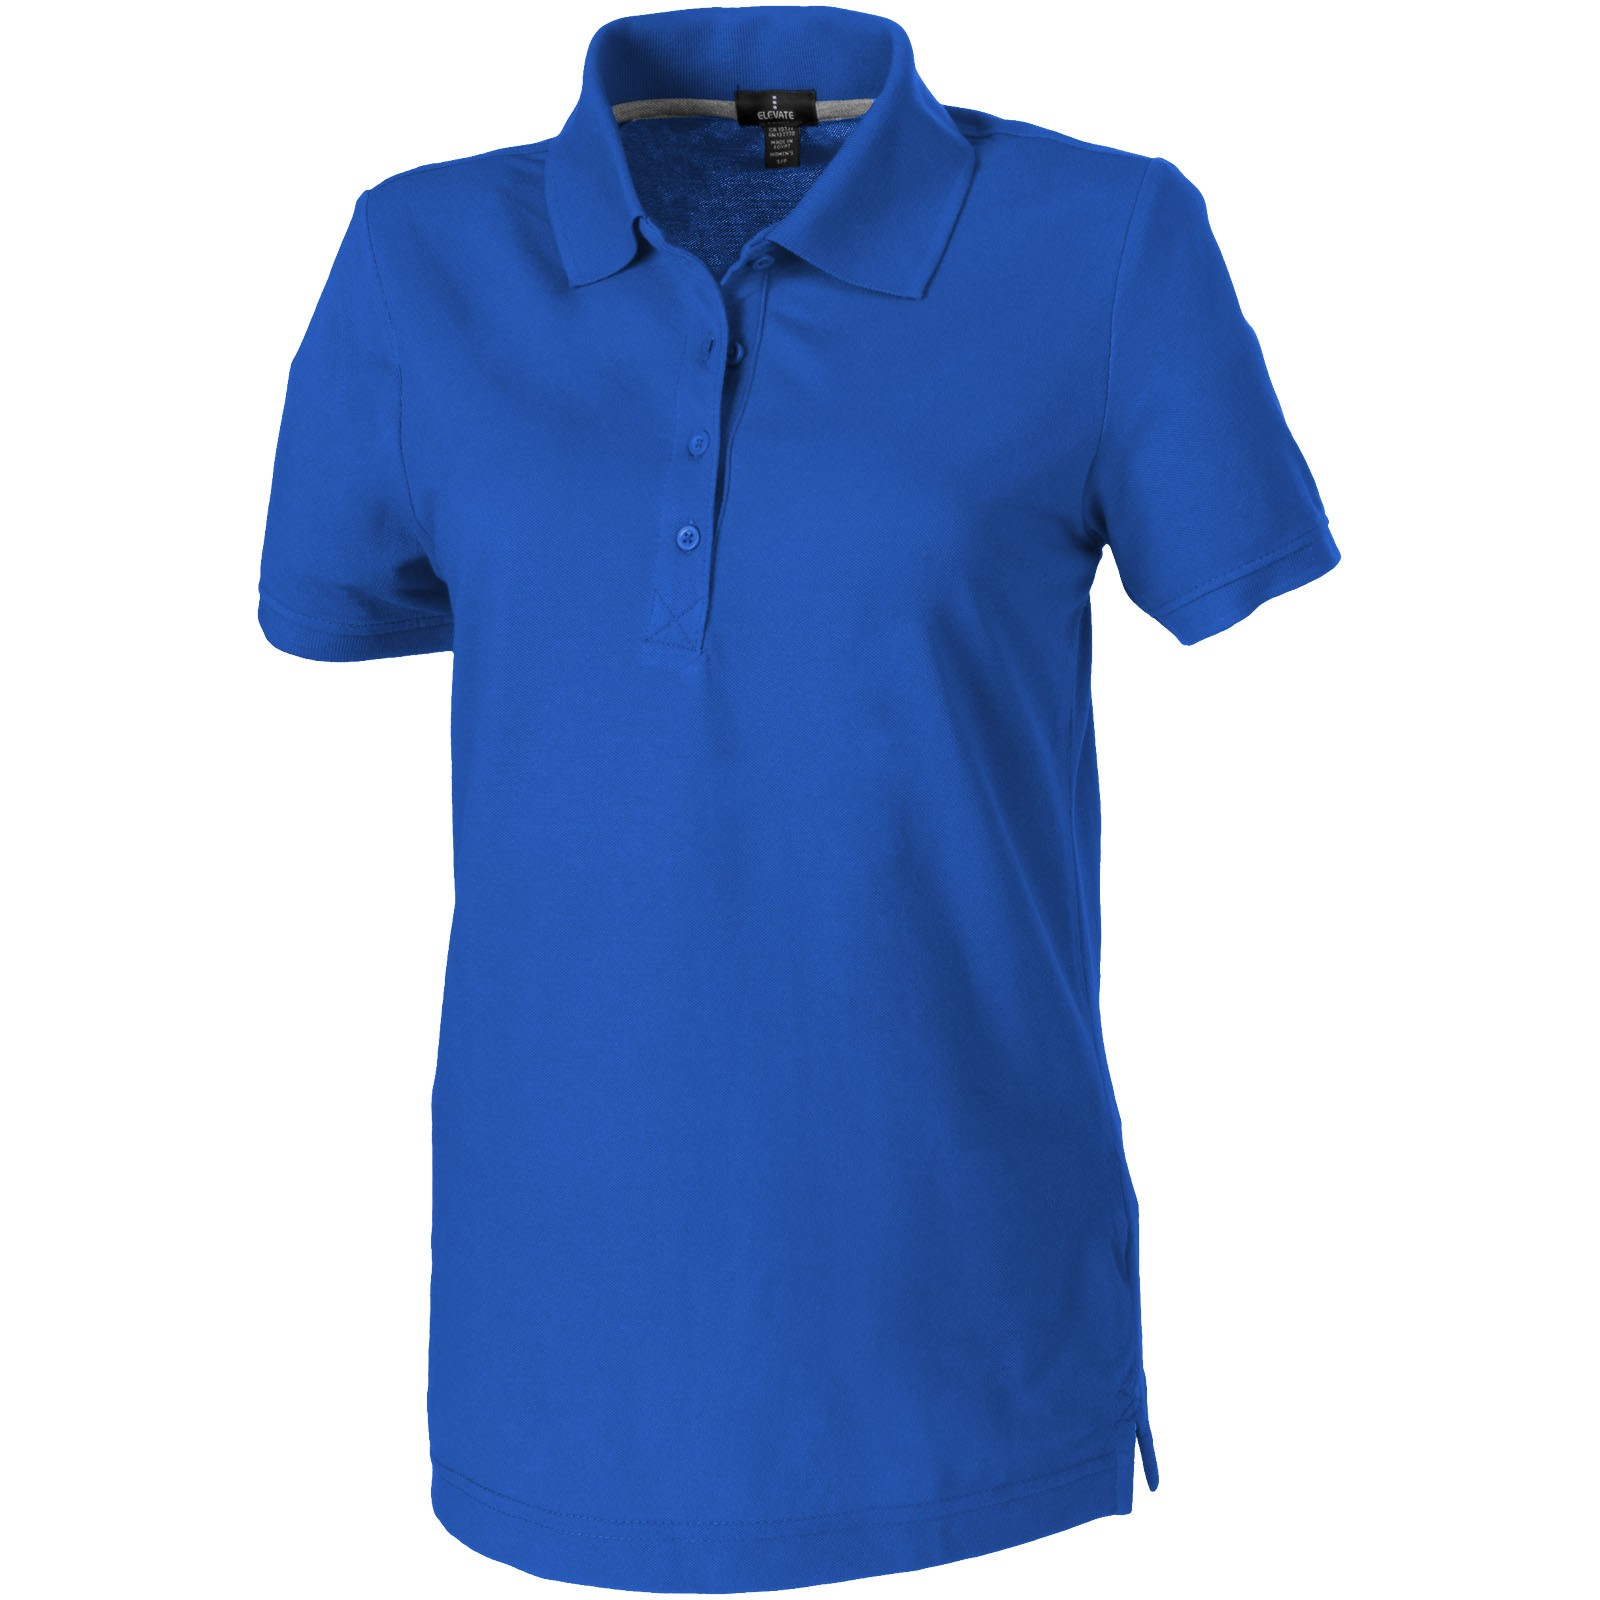 Crandall short sleeve women's polo - Blue / M